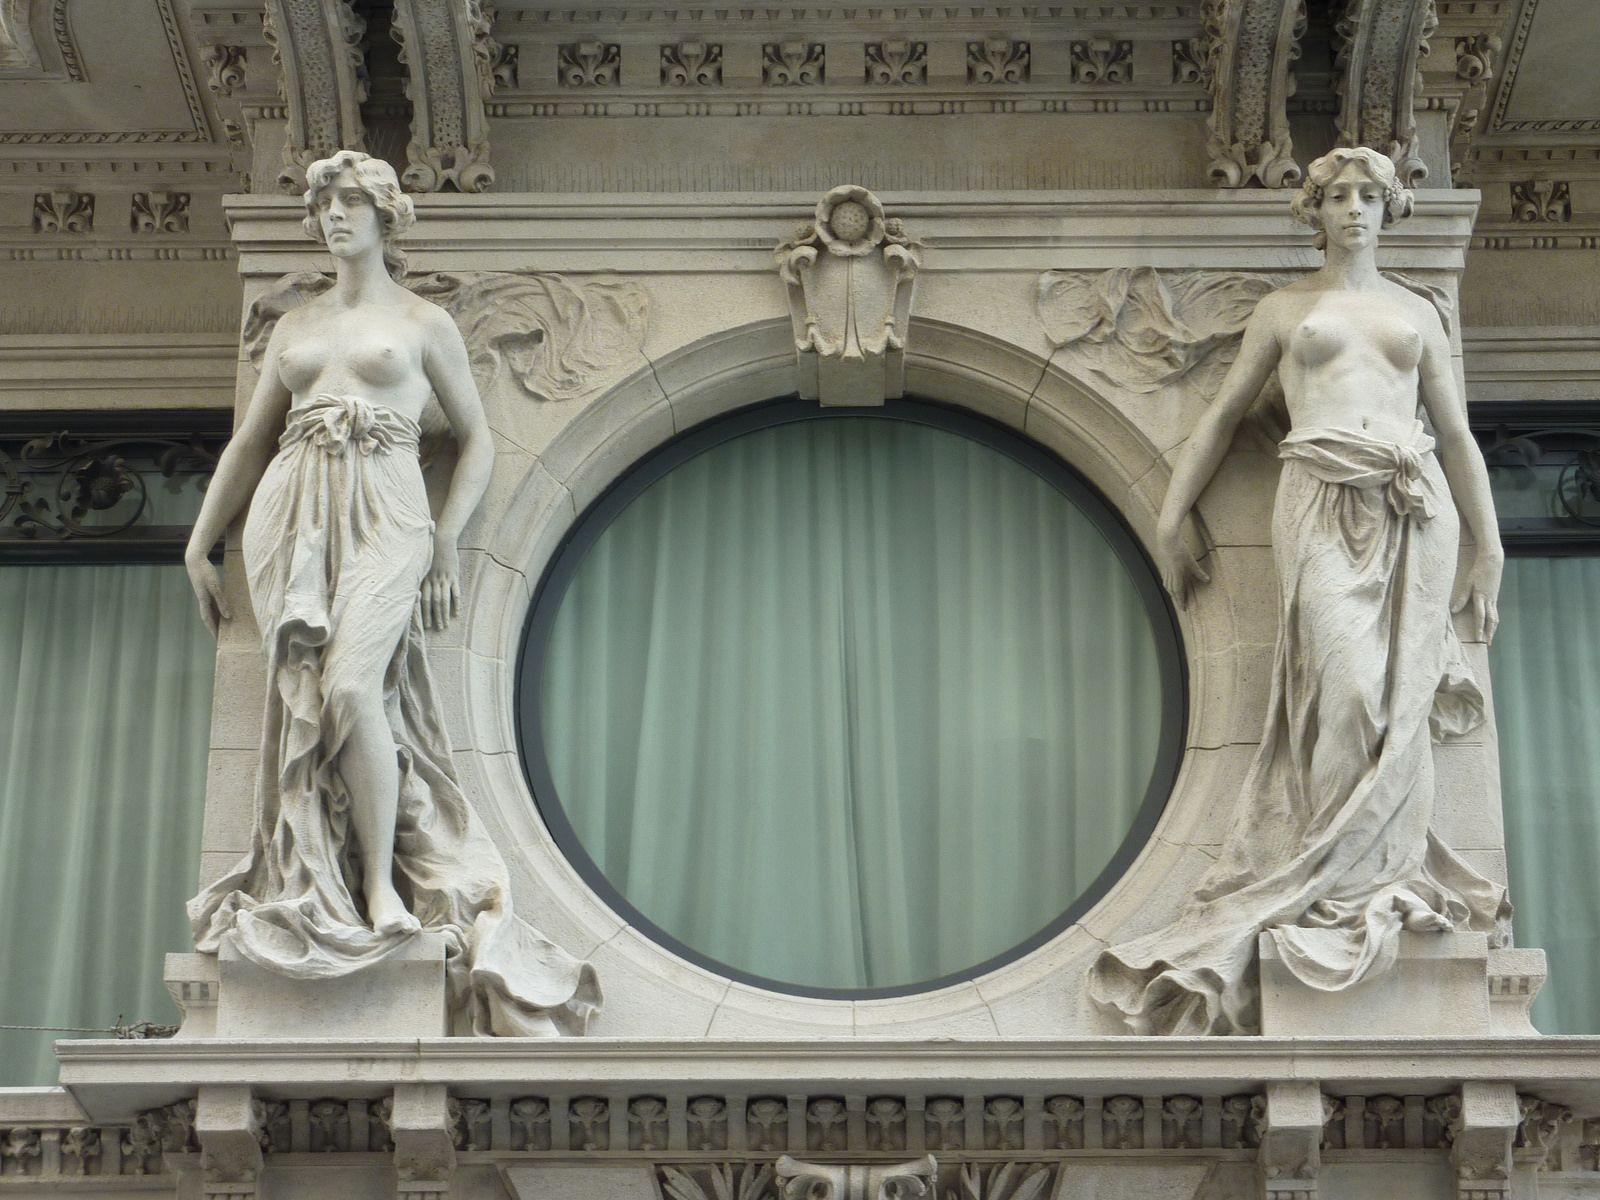 Trieste, Woman statues on a building     #TuscanyAgriturismoGiratola